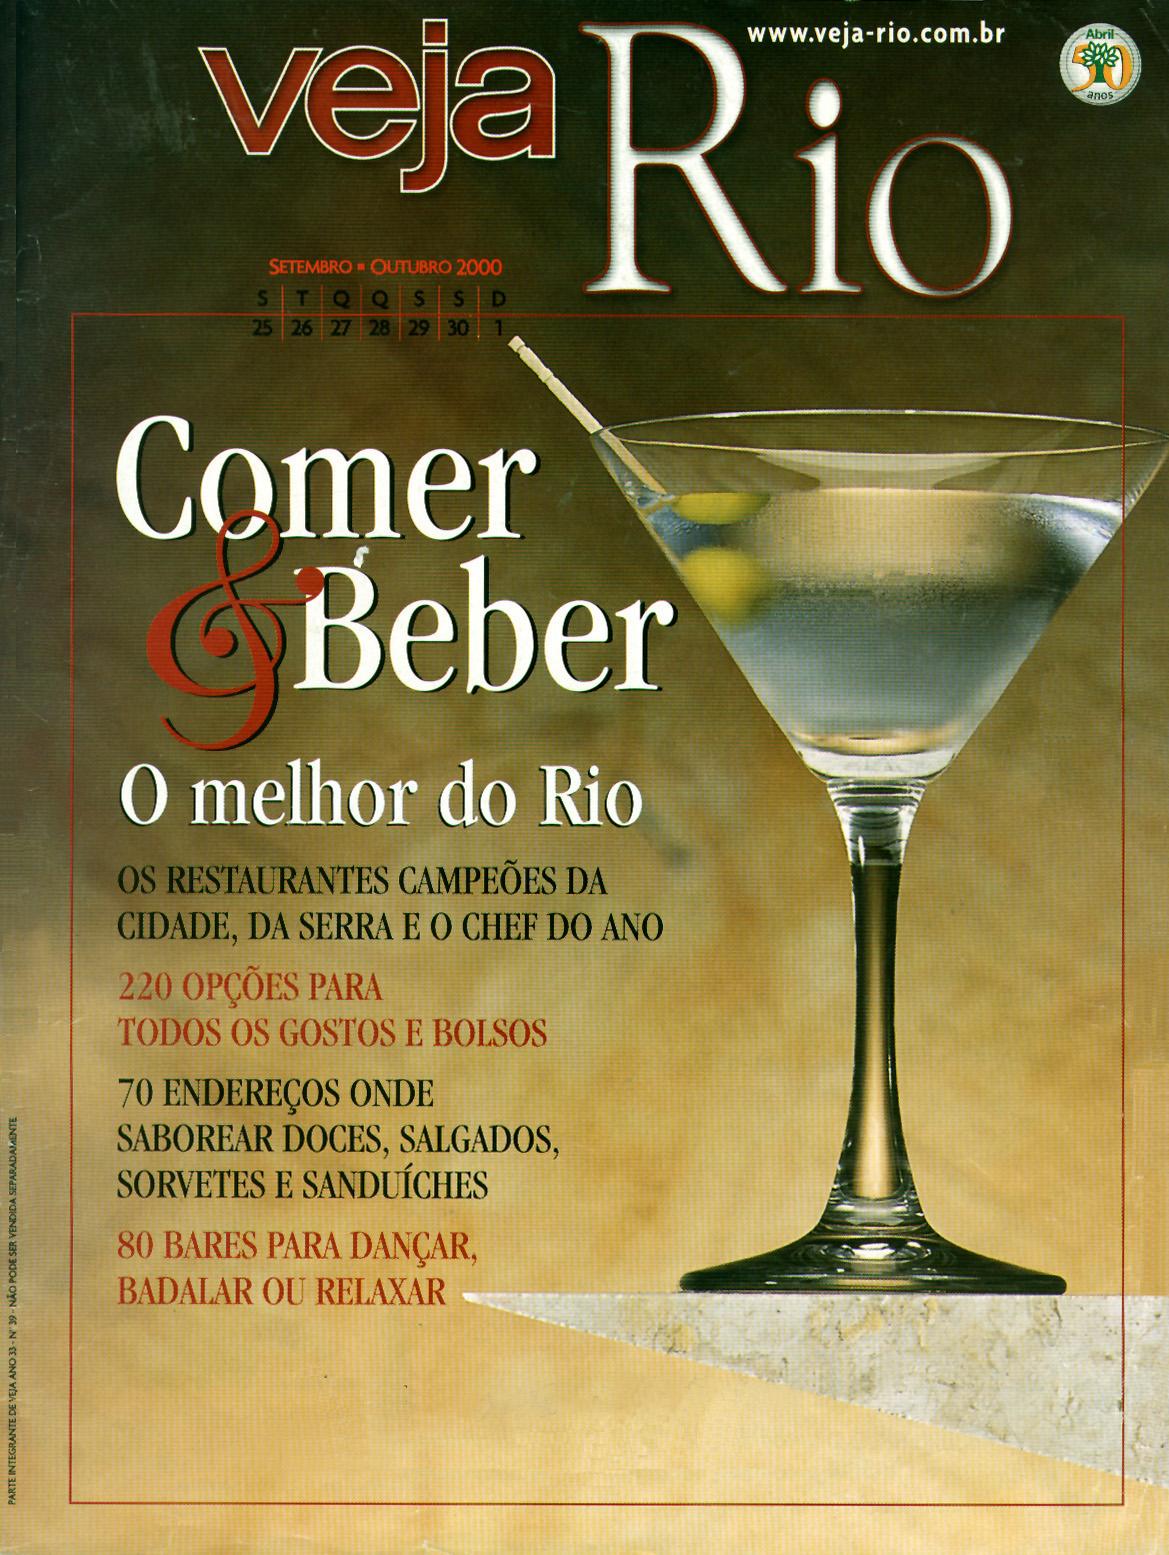 Capa da revista Veja Rio Especial Comer & Beber, de 27 de setembro de 2000